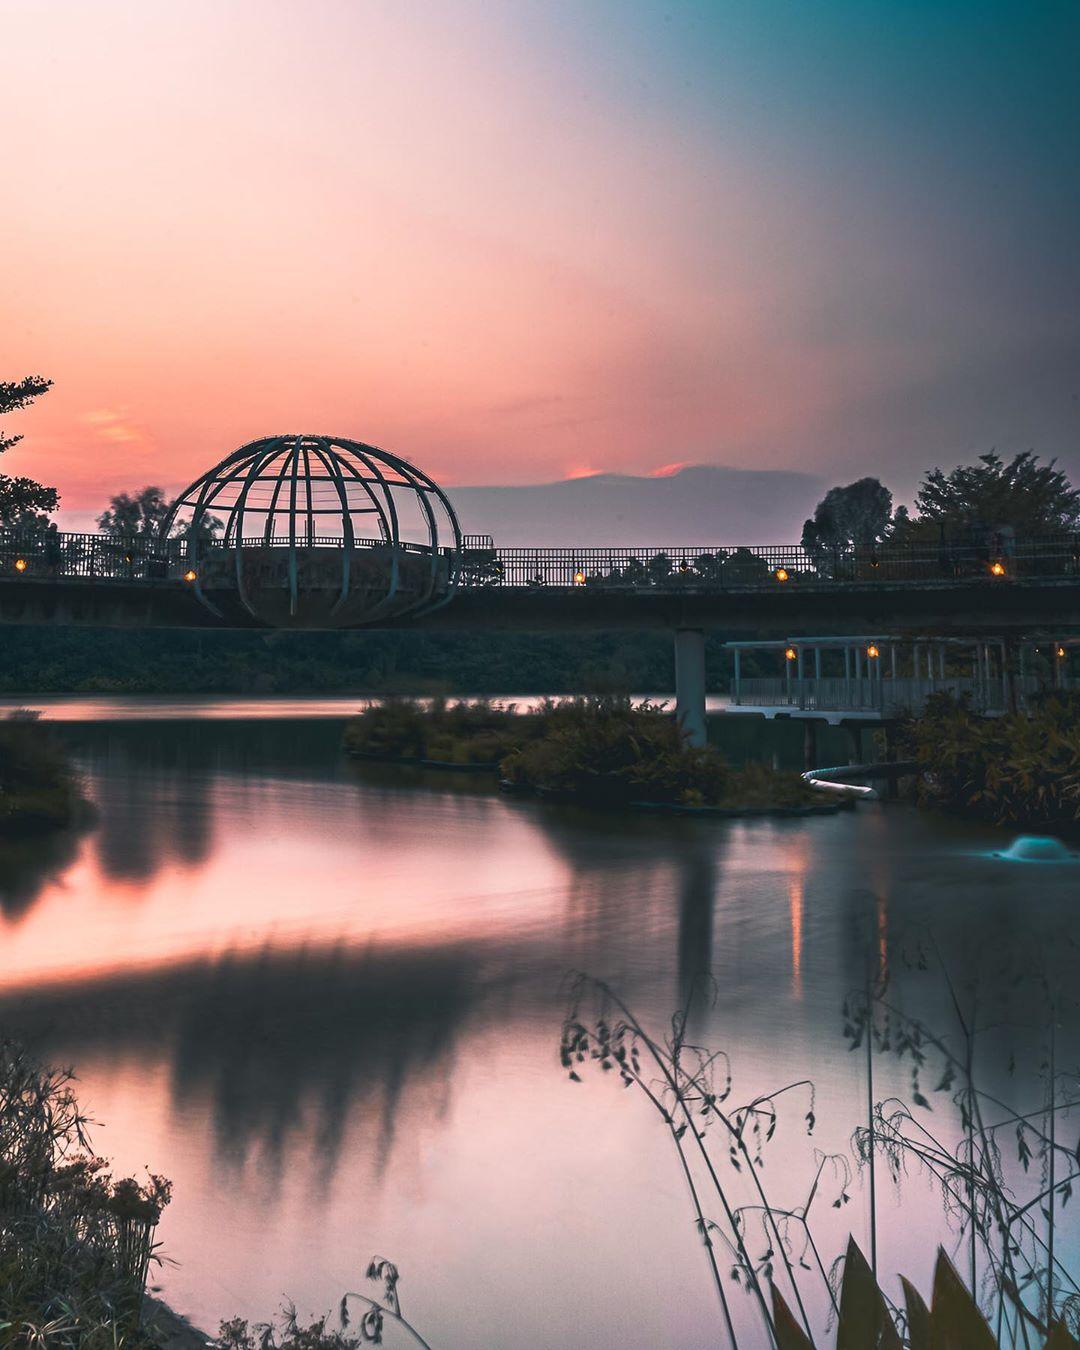 sunrise and sunset in singapore - punggol waterway park jewel bridge